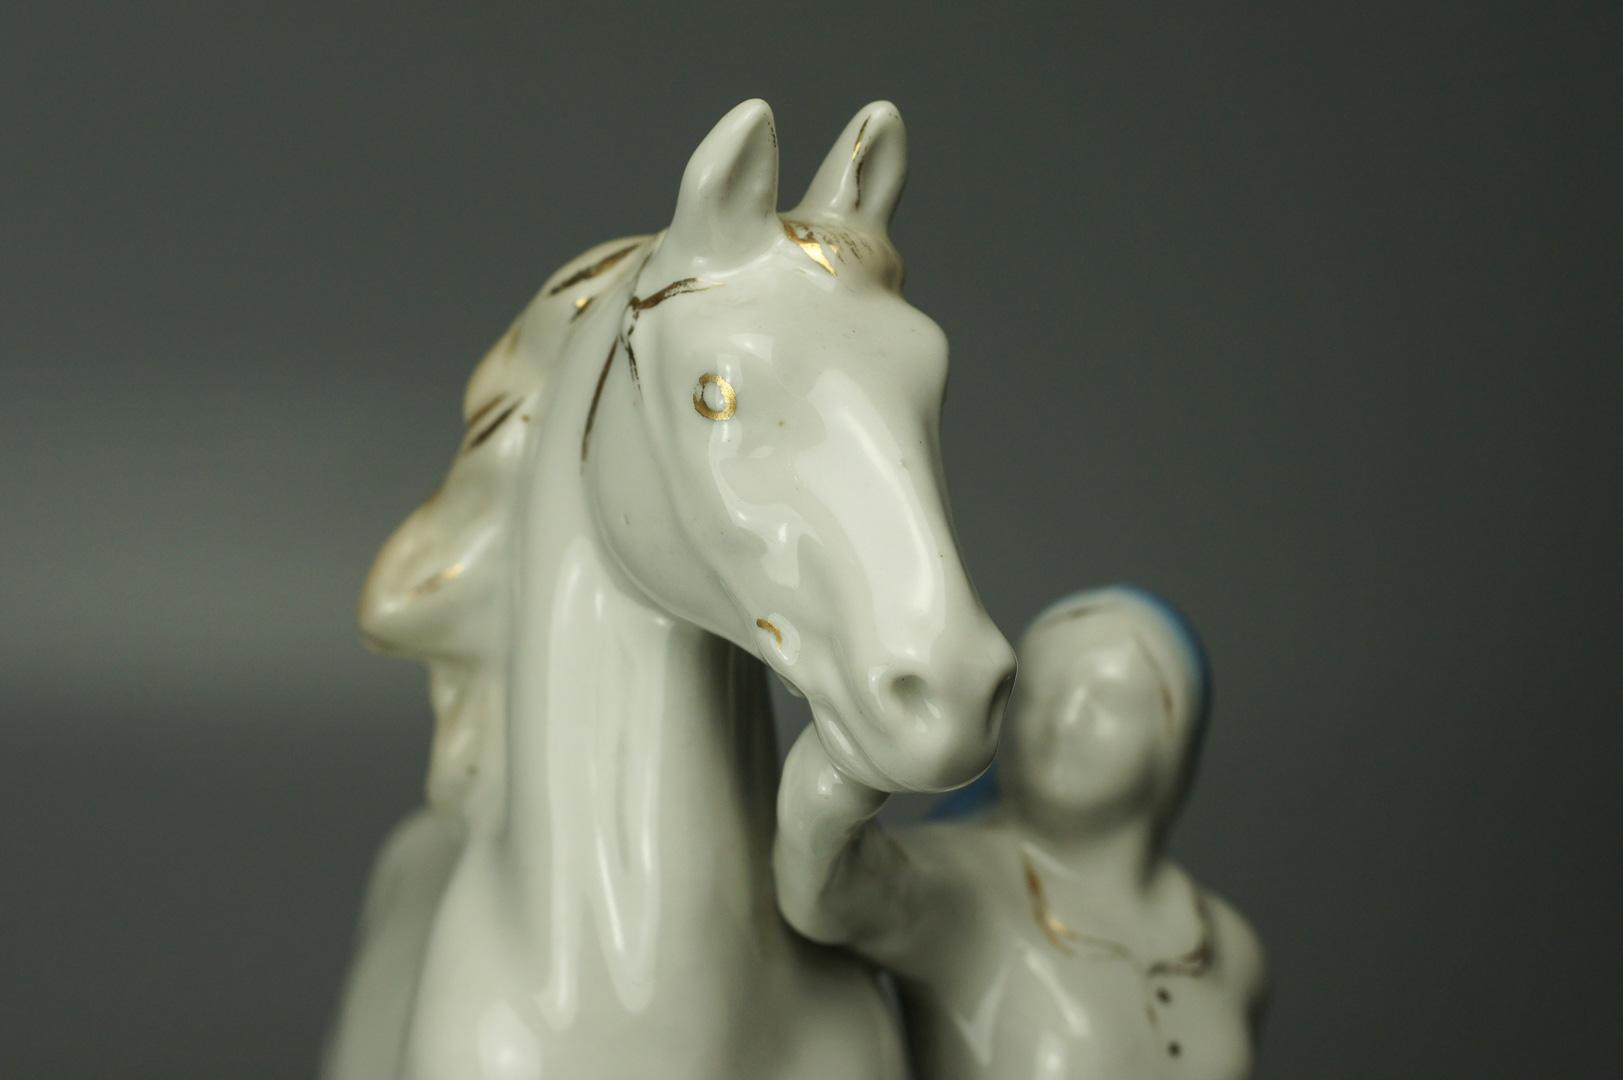 Статуэтка Конезаводчица (Колхозница с конем) Старая Гжель